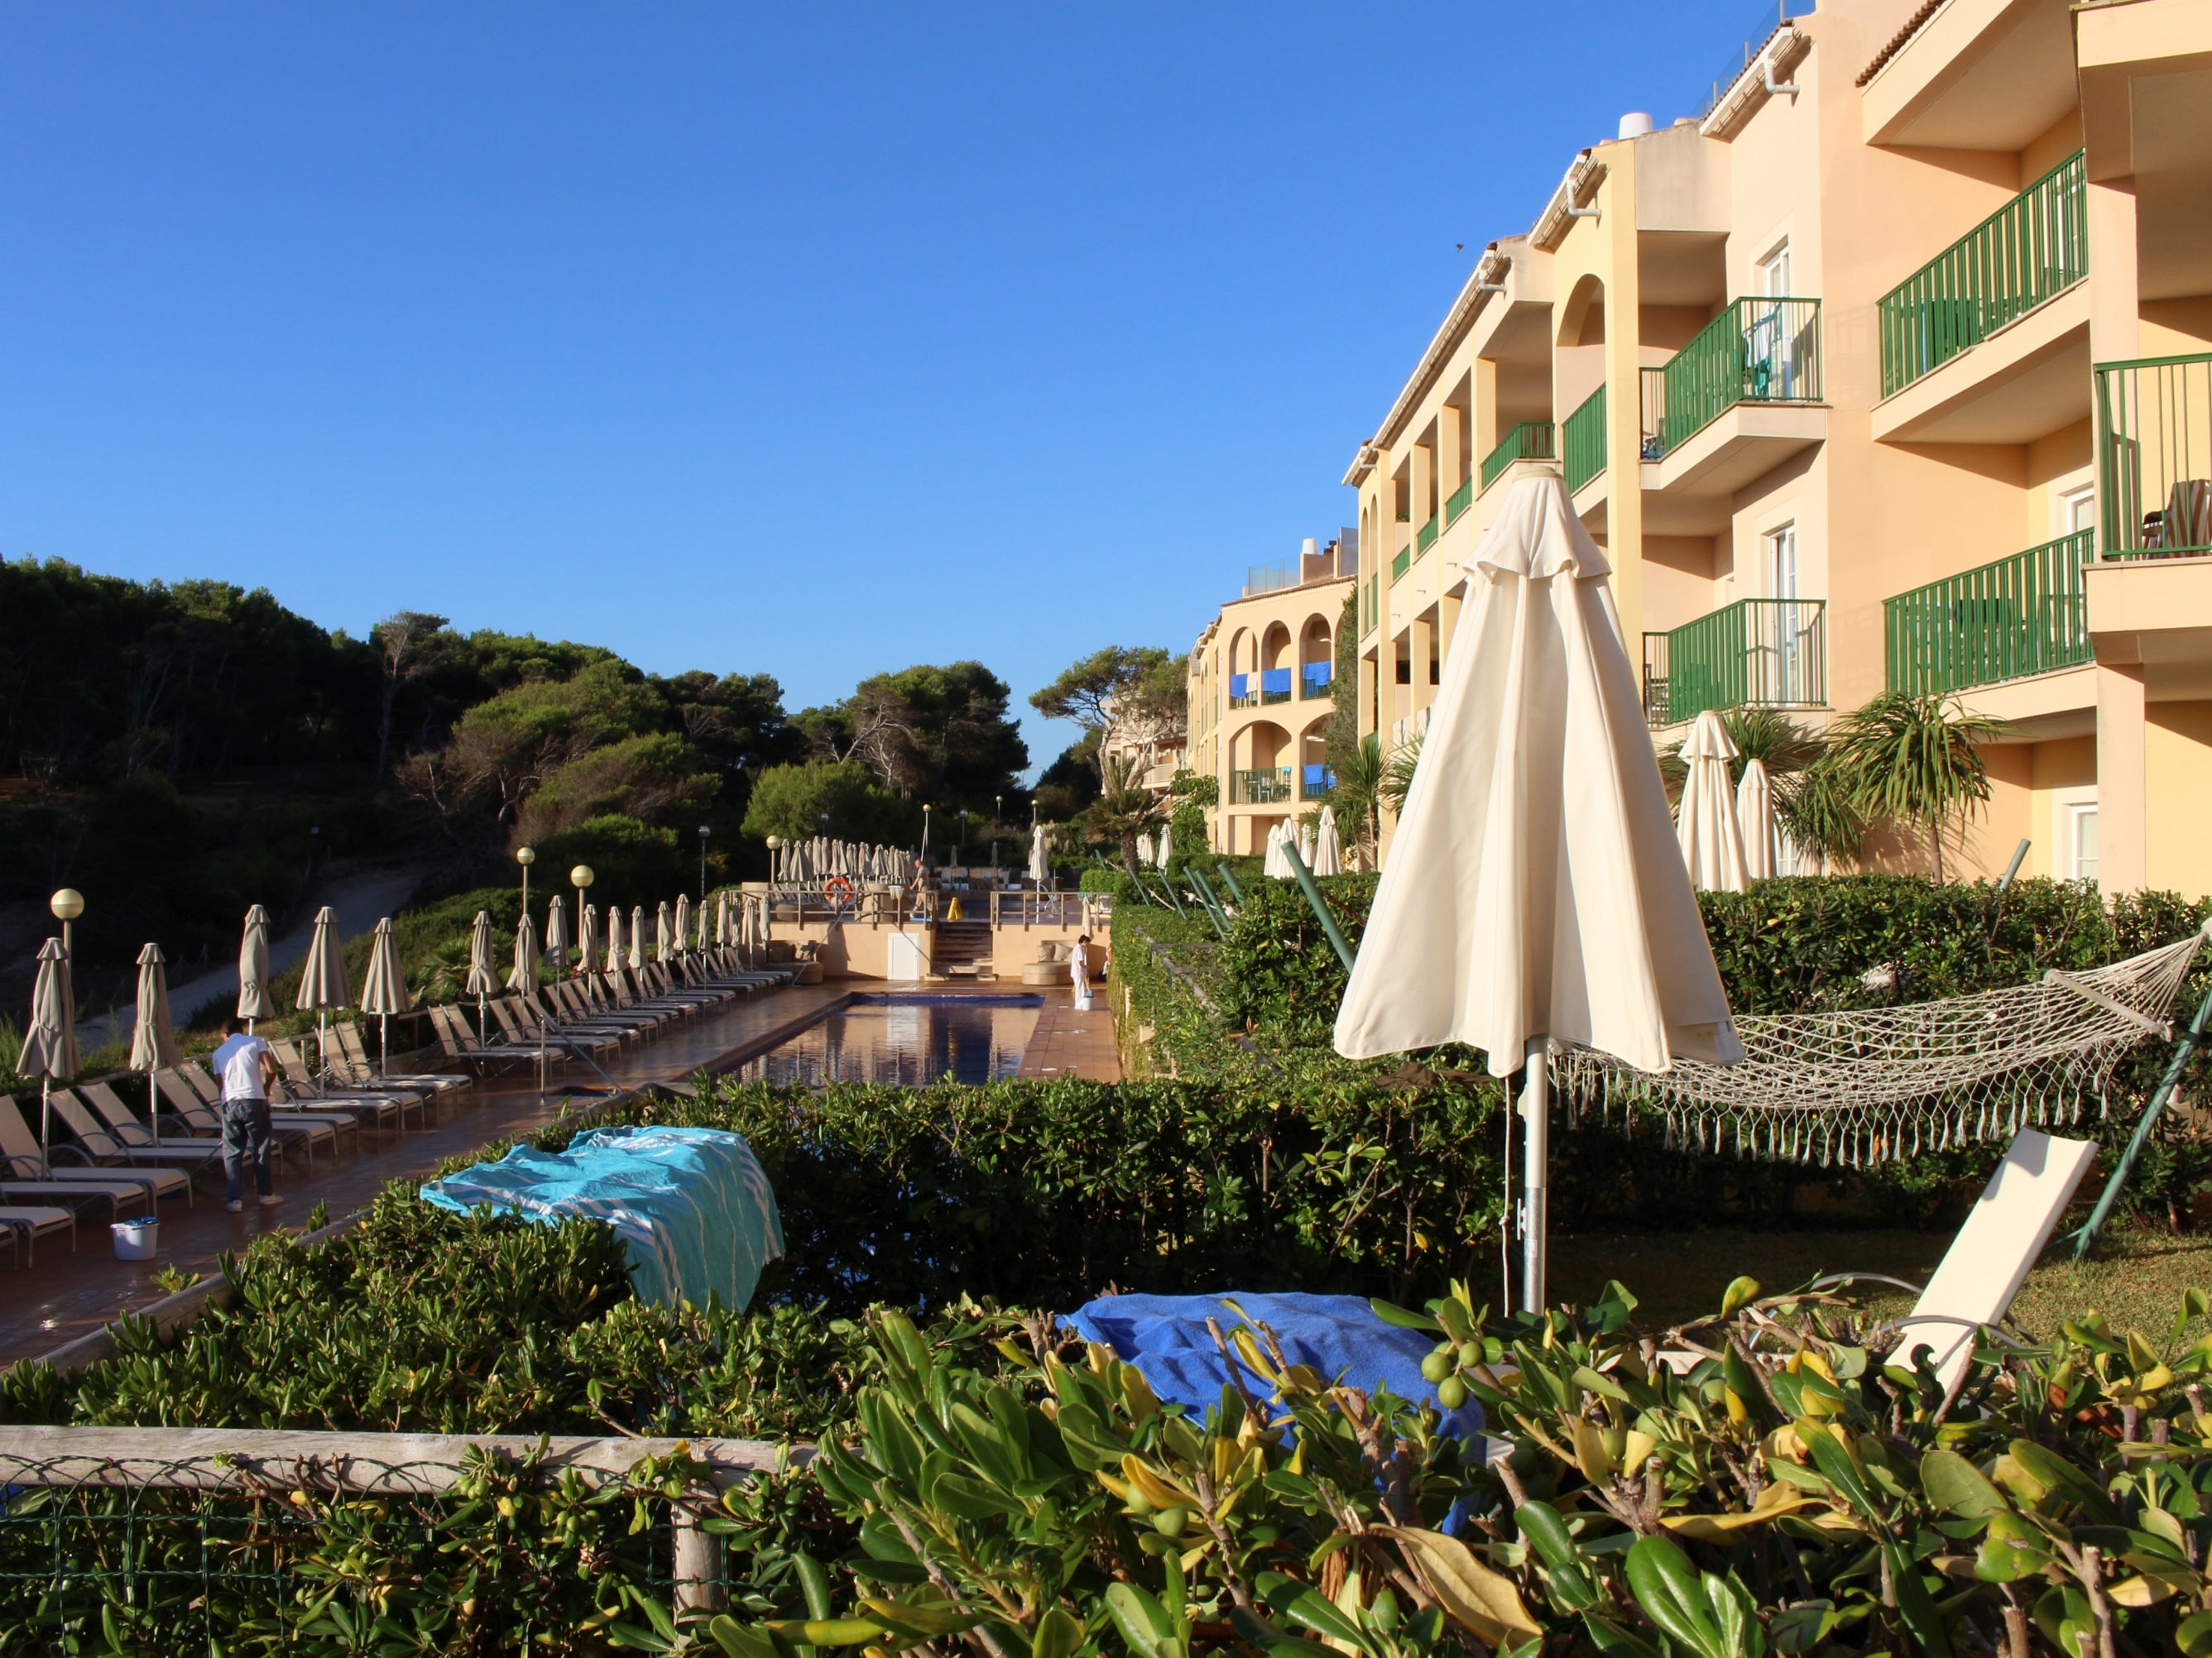 Blogpost Mallorca3, Cala-Santanyi1aa, Christinas, fitlife, blog, fitness, ernährung, lifestyle, rezepte, Mallorca